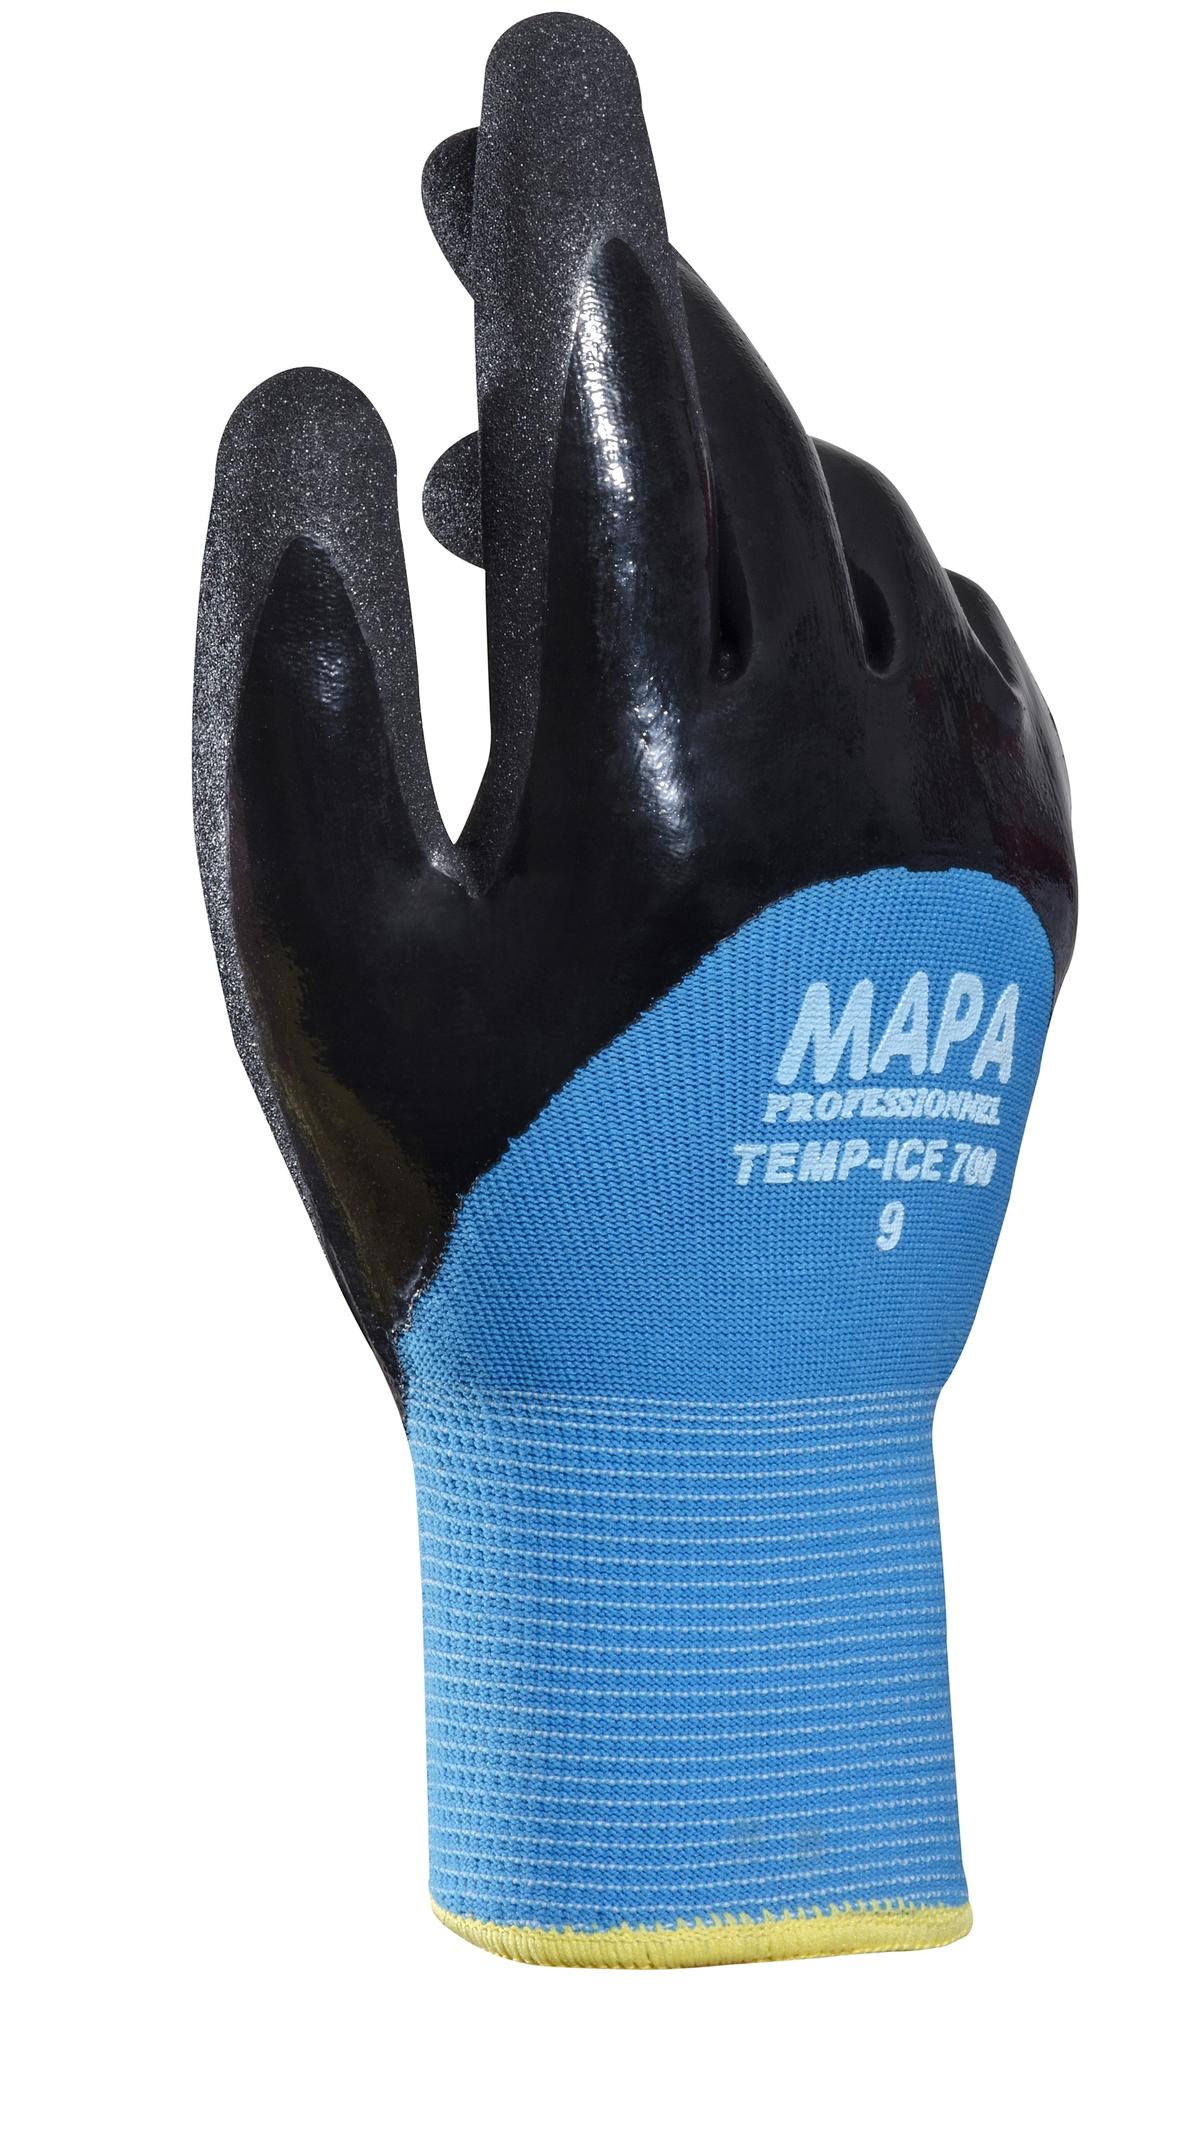 Paire de gants anti-froid noir taille 9 Temp Ice Mapa